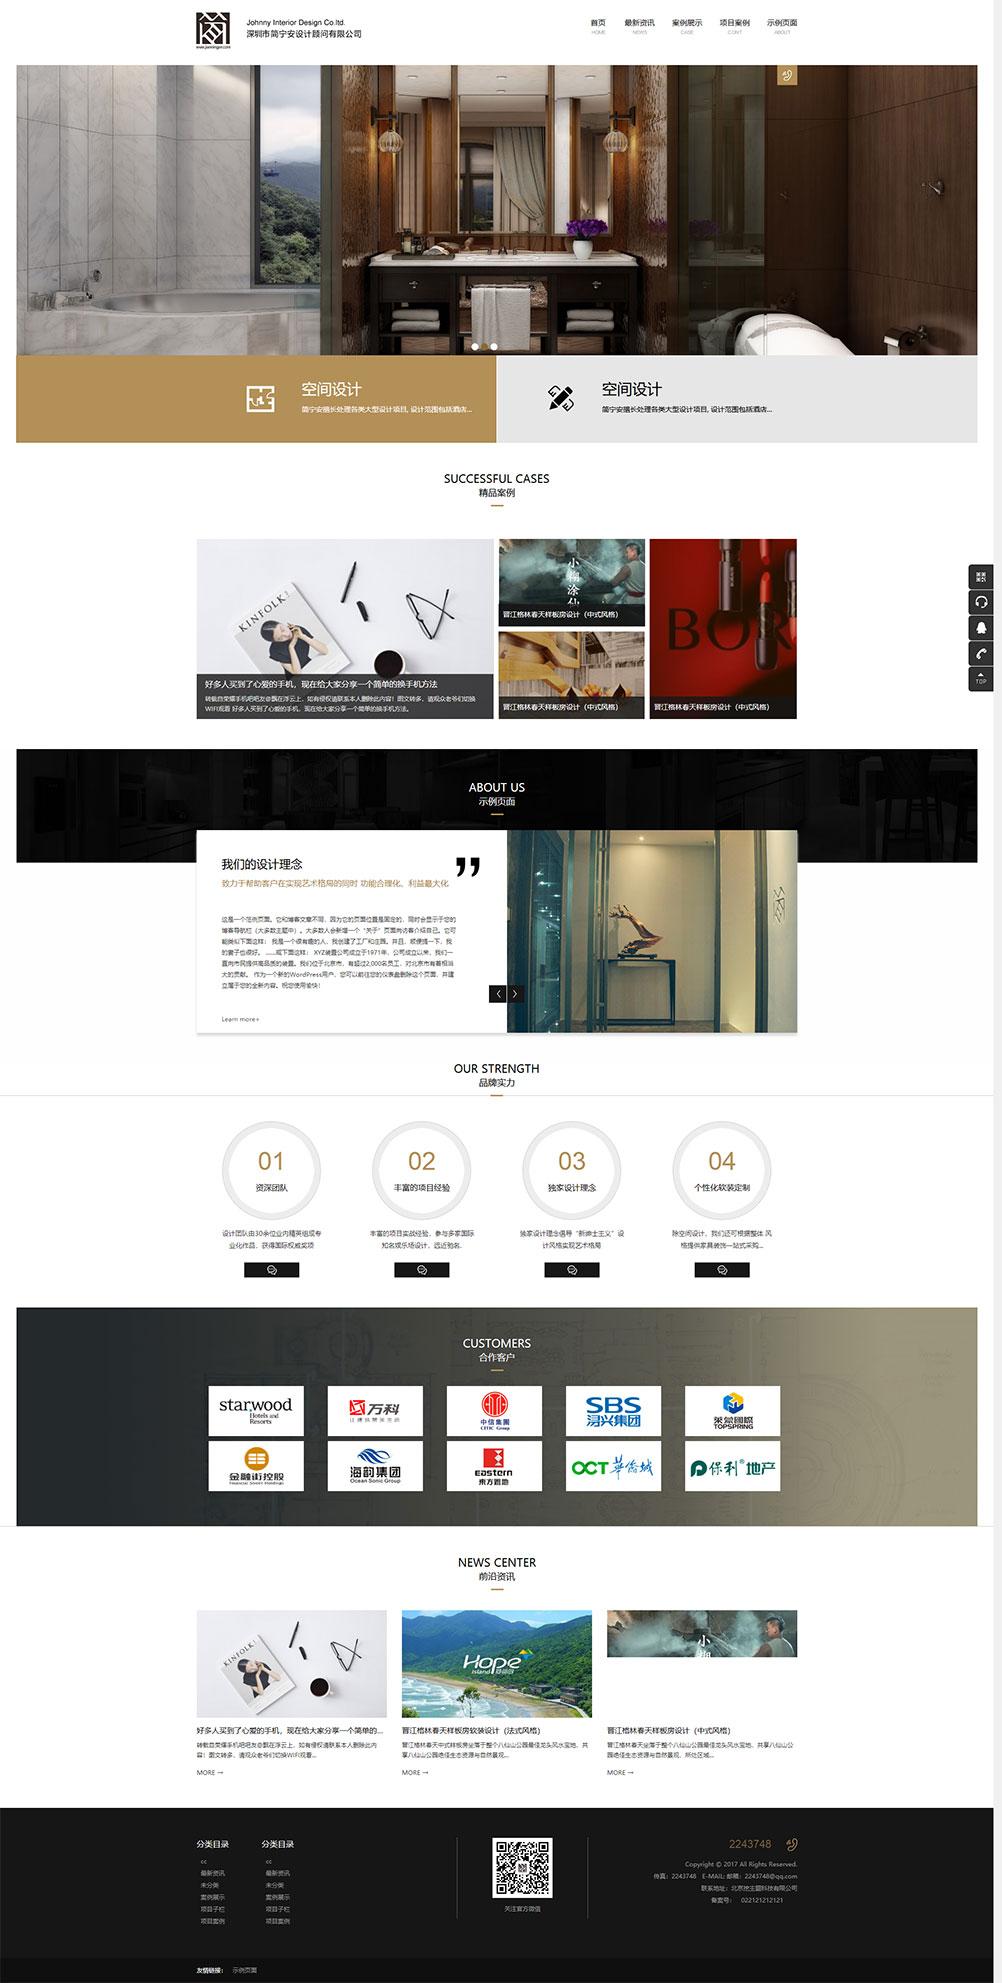 XL-027.家装酒店室内设计样板房软装设计类网站